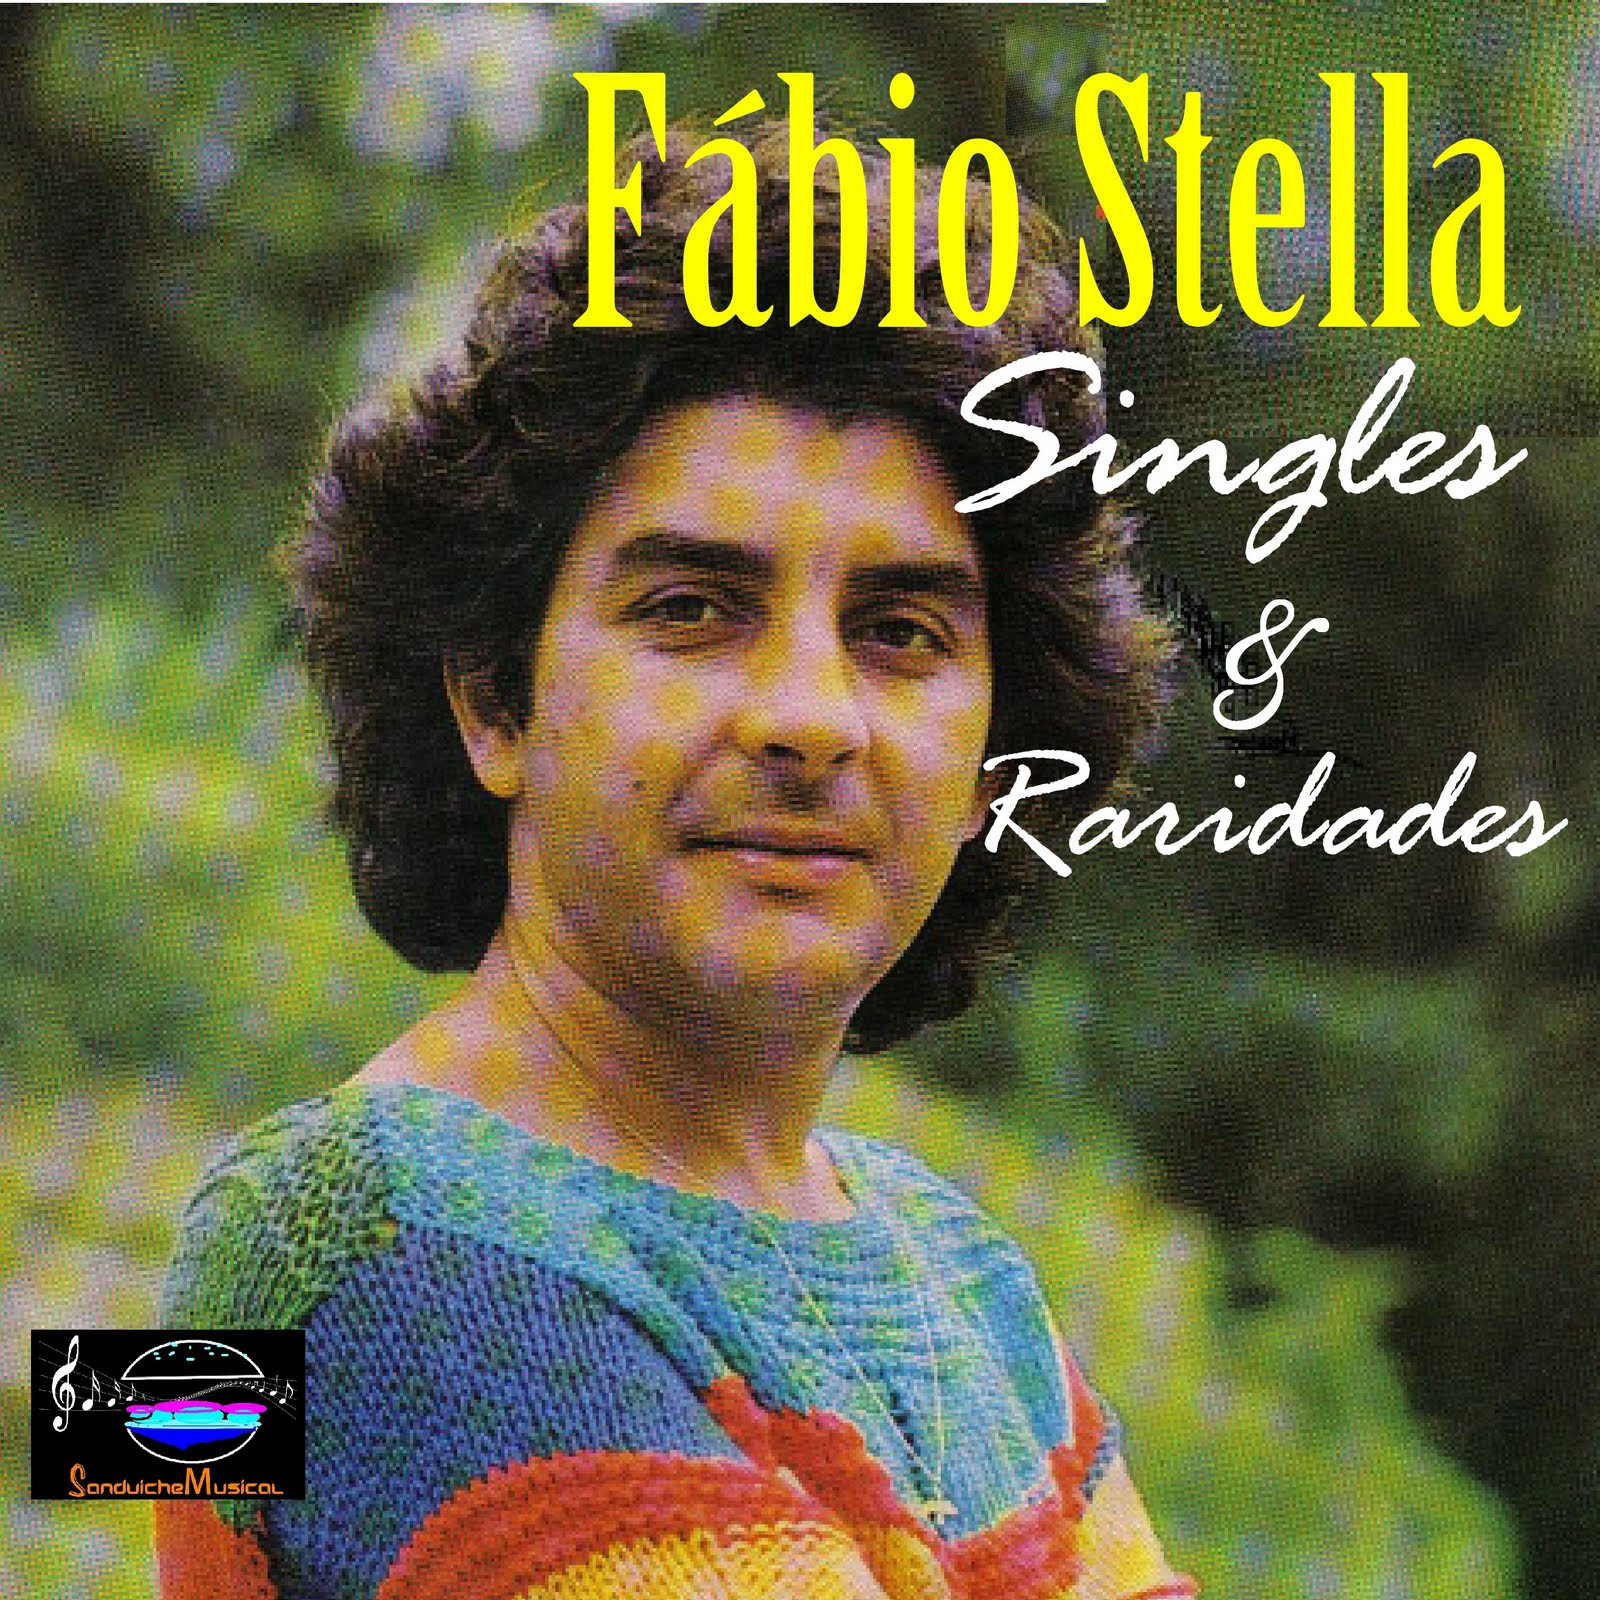 Stella rosa singles